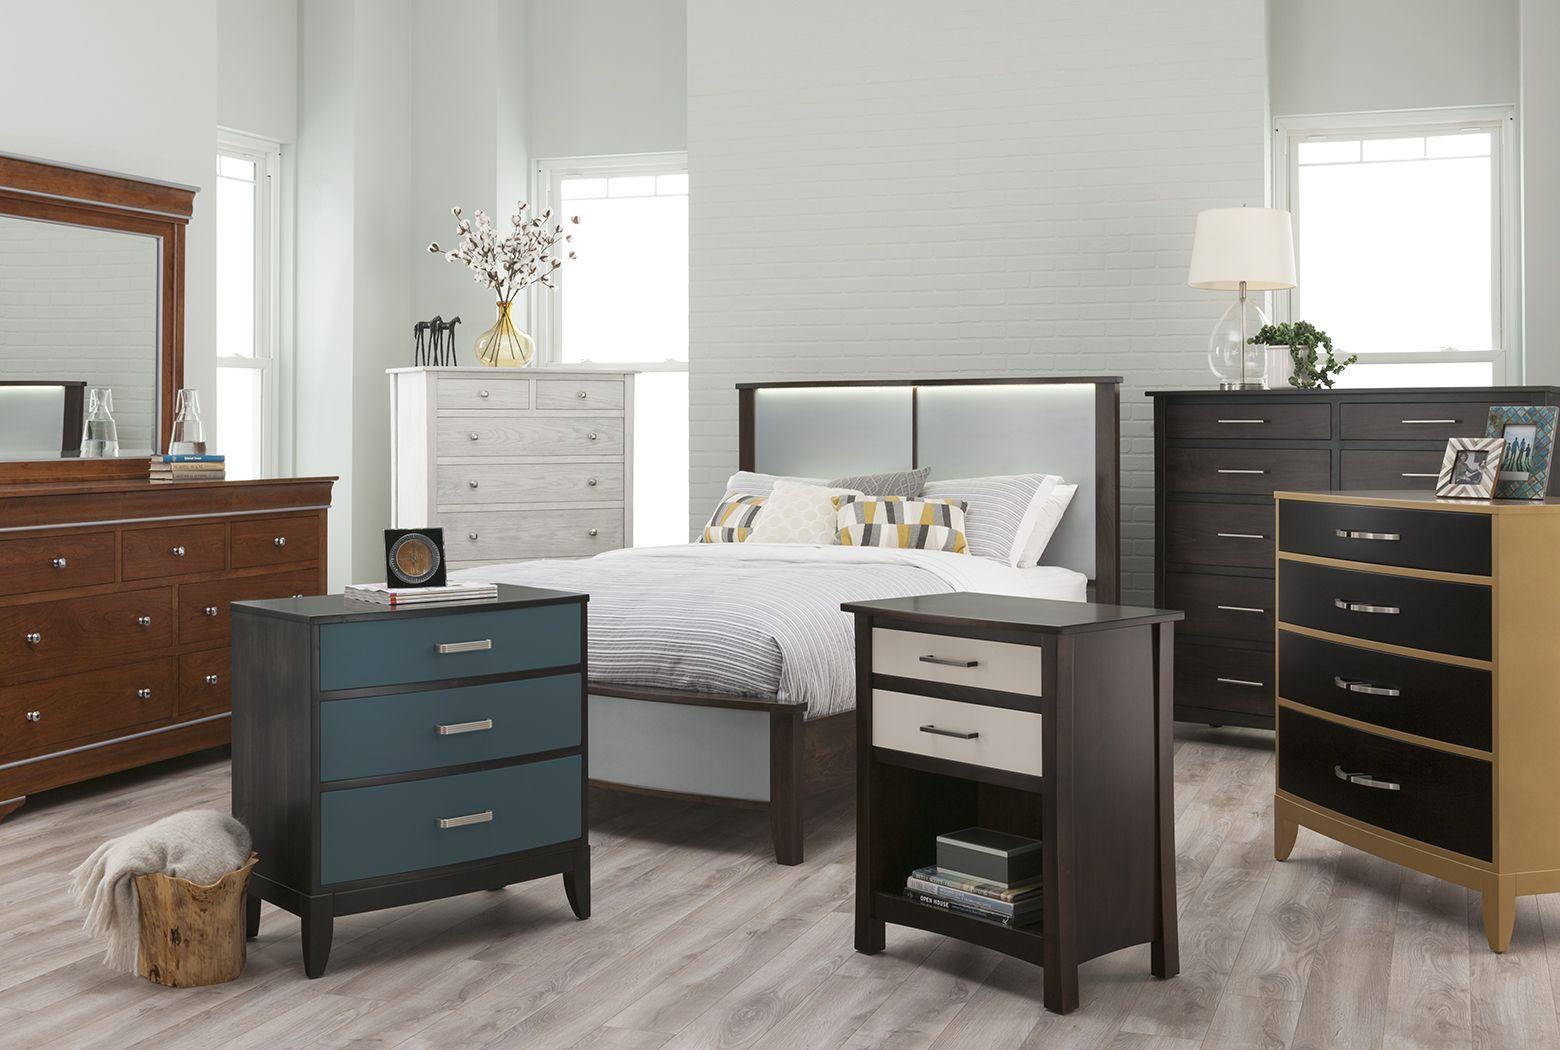 Hand Made Bedroom Furniture by Keystone Home   CustomMade.com